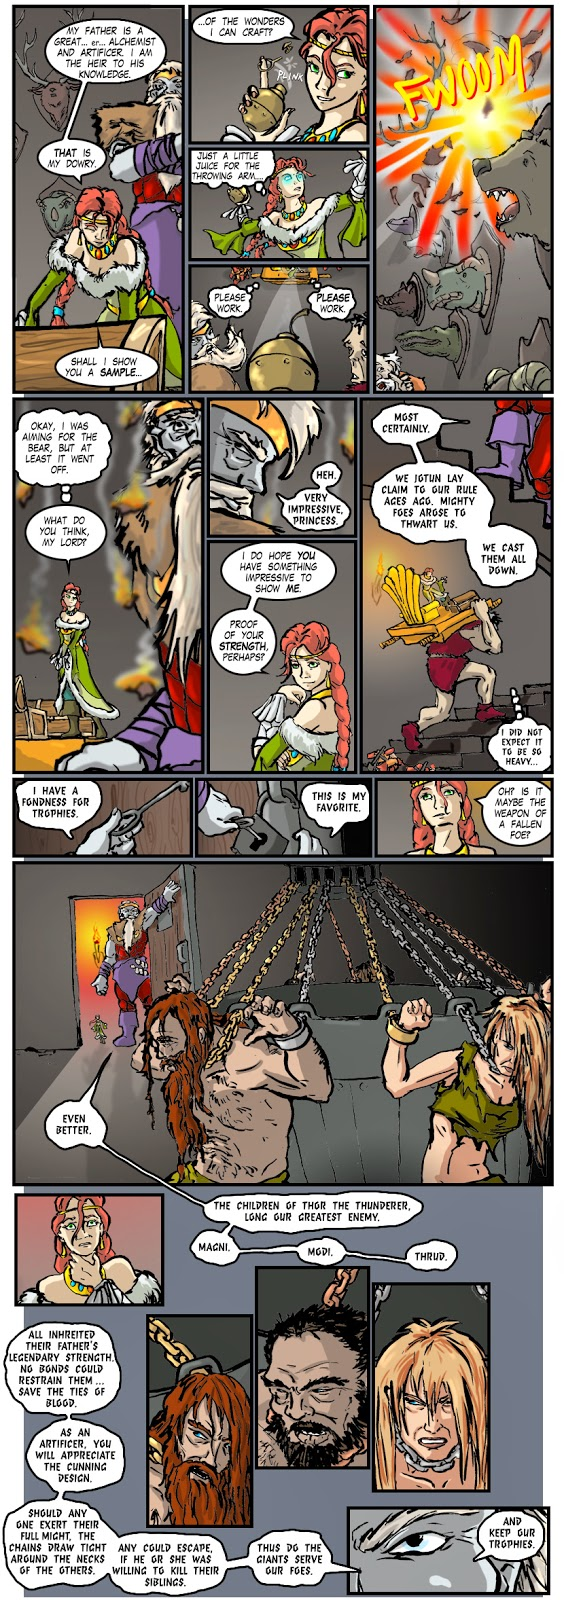 http://talesfromthevault.com/thunderstruck/comic695.html